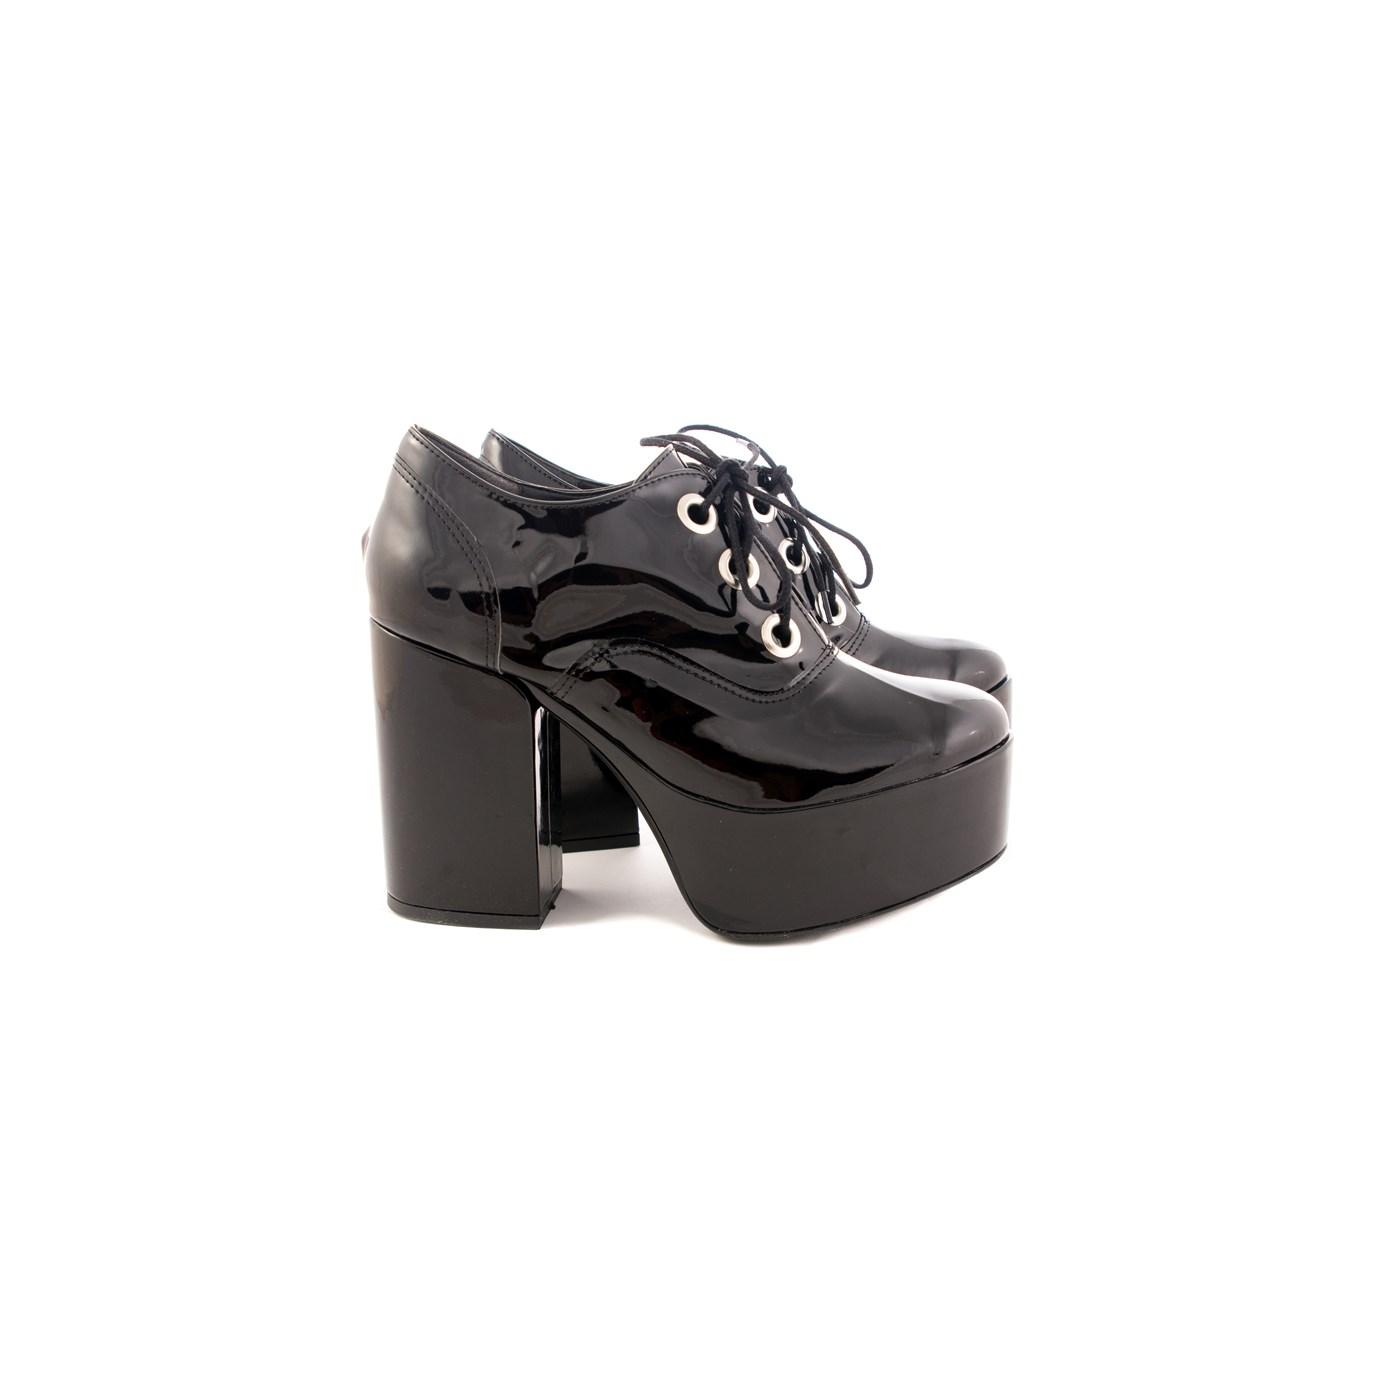 b245b15a Zapatos Botinetas Plataforma Charol Mujer Moda 2018 | elmago.com.ar